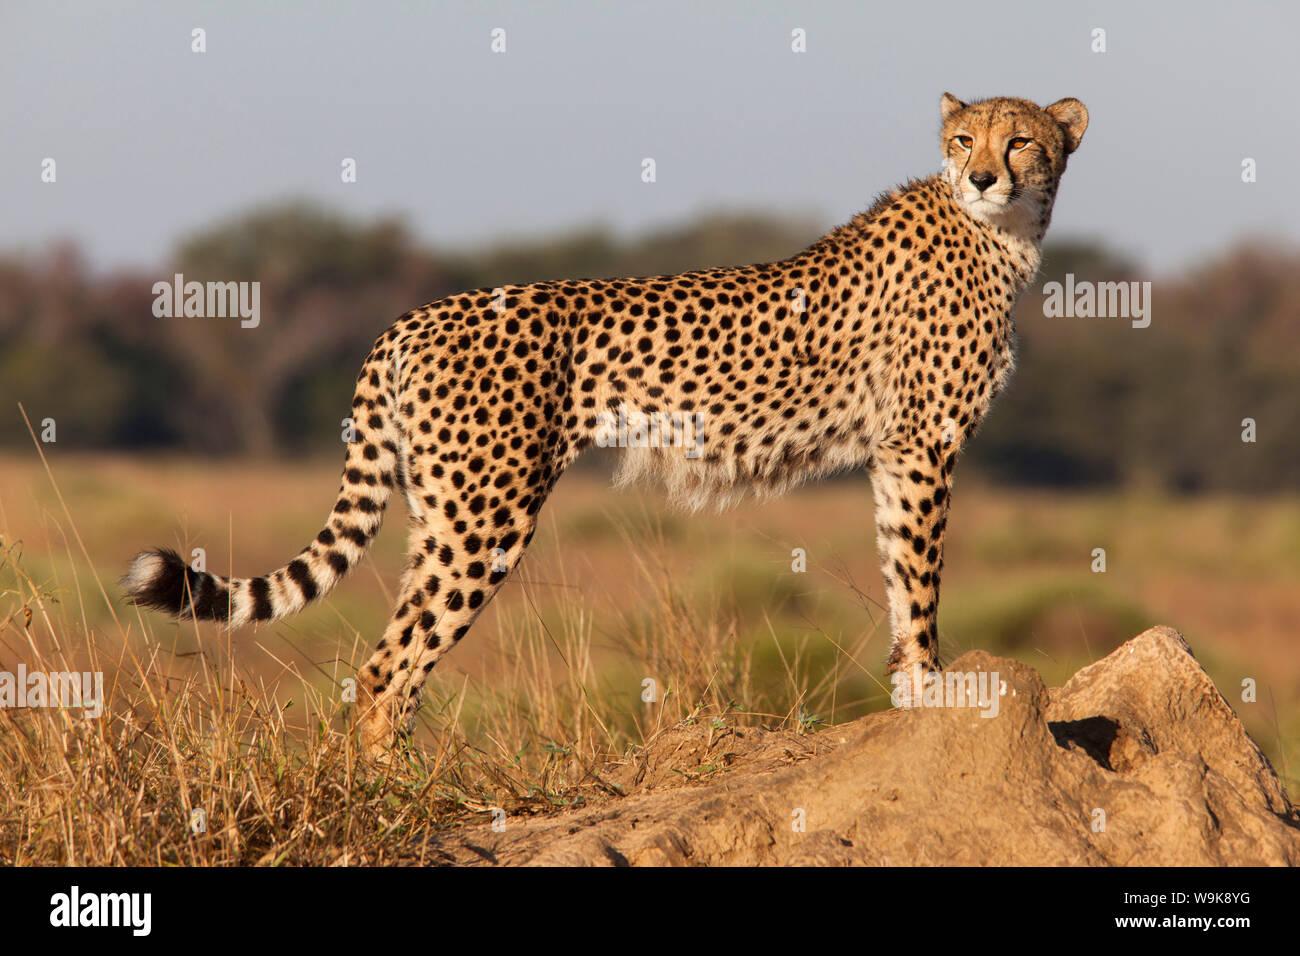 Cheetah female (Acinonyx jubatus), Phinda private game reserve, Kwazulu Natal, South Africa, Africa Stock Photo